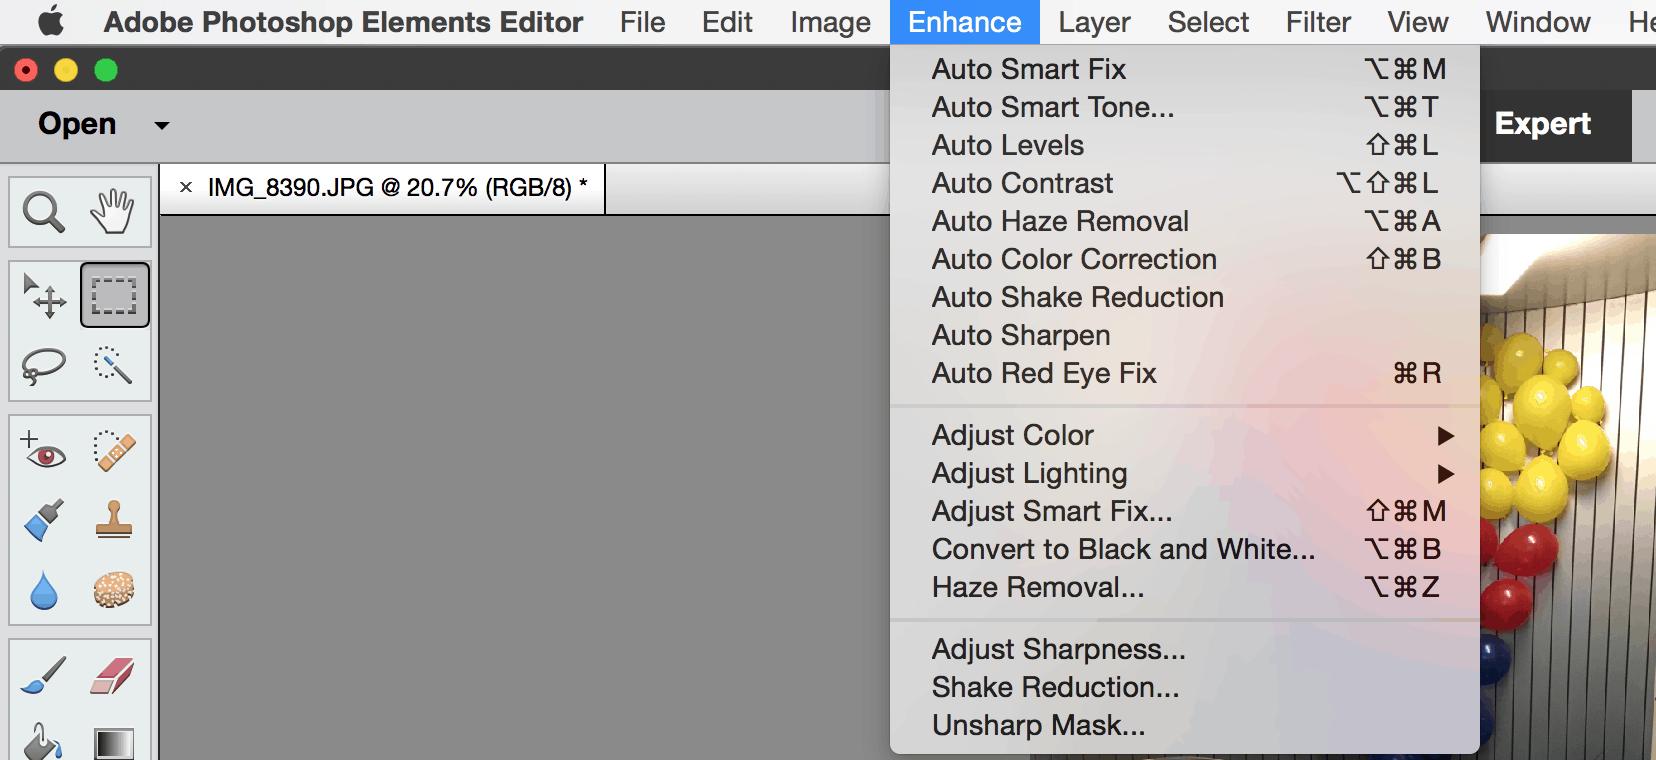 Adobe PhotoShop Elements + Premiere Elements 14 | Whisky +